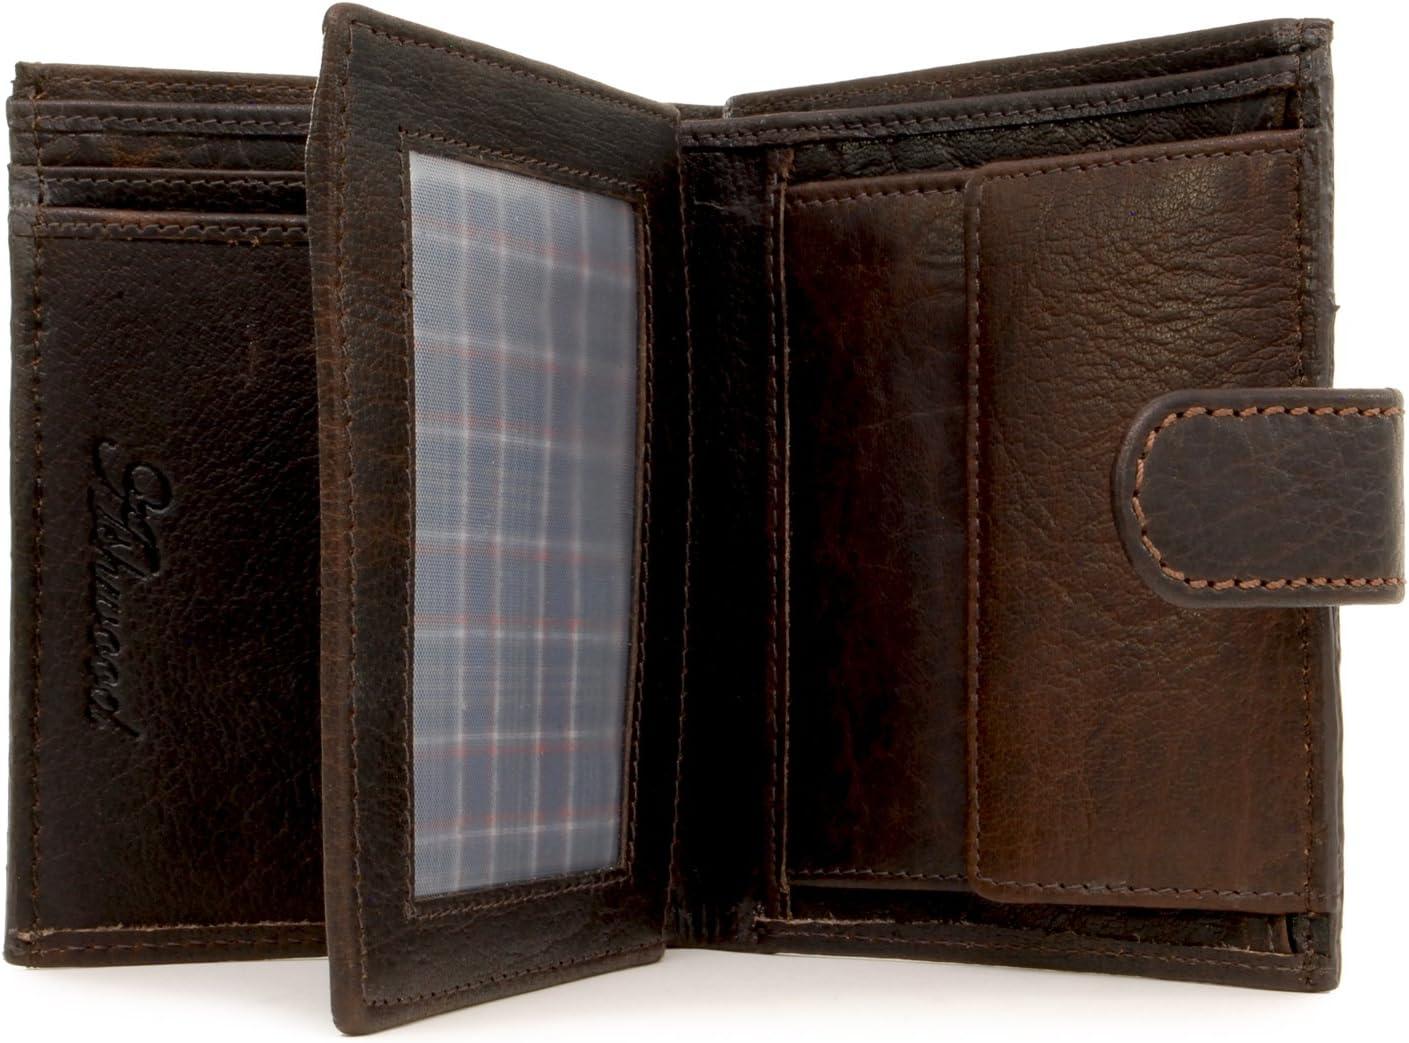 Marron Buffalo Cuir V/éritable Coffret Cadeau Homme Portefeuille//Porte Monnaie ASHWOOD Grande Capacite 1412